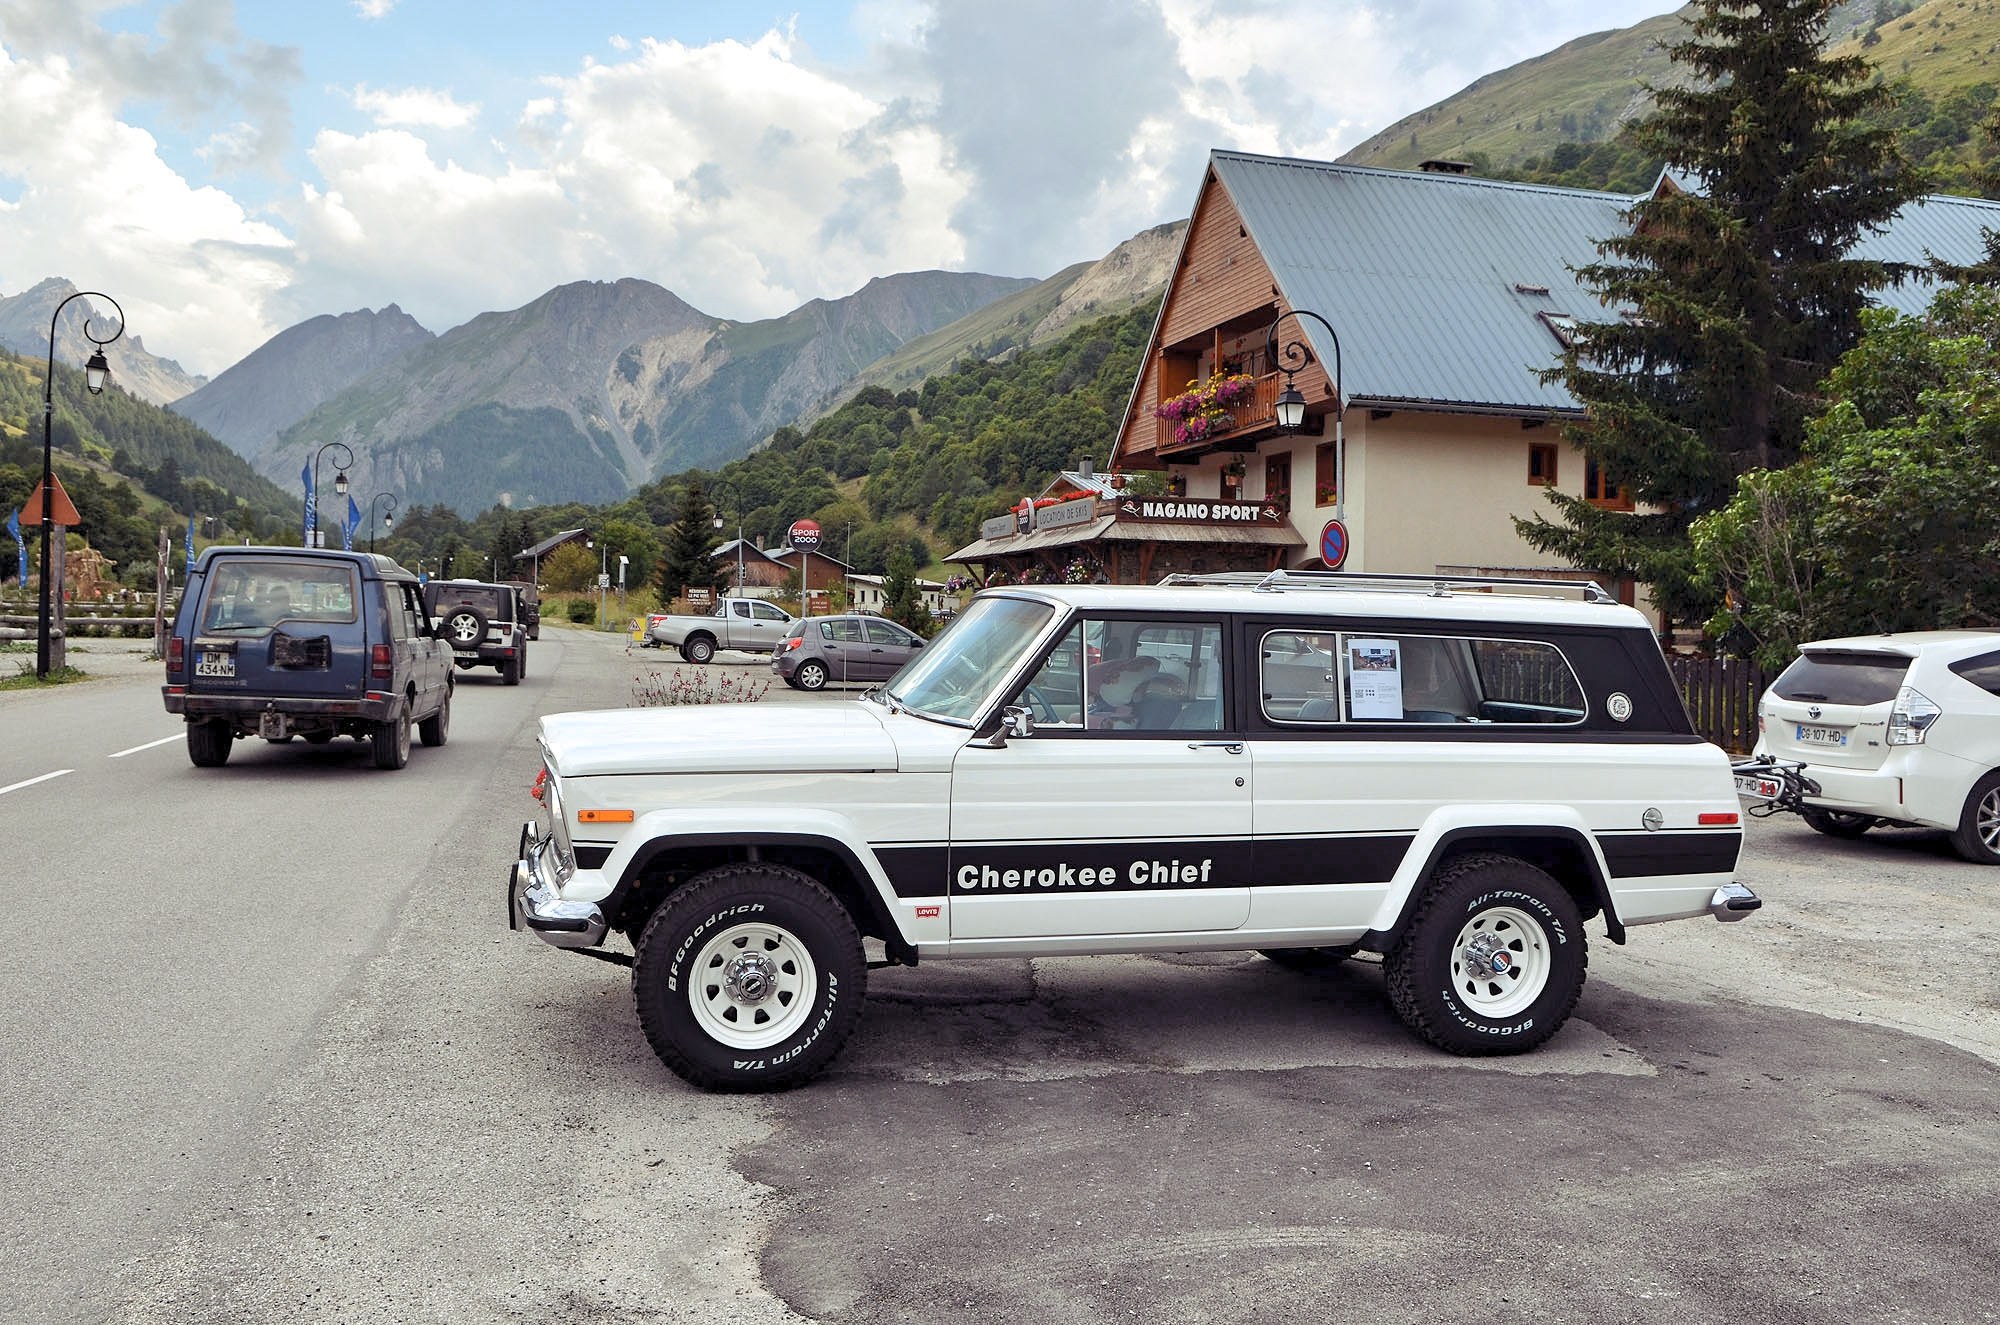 jeep-cherokee-chief-valloire-051.JPG